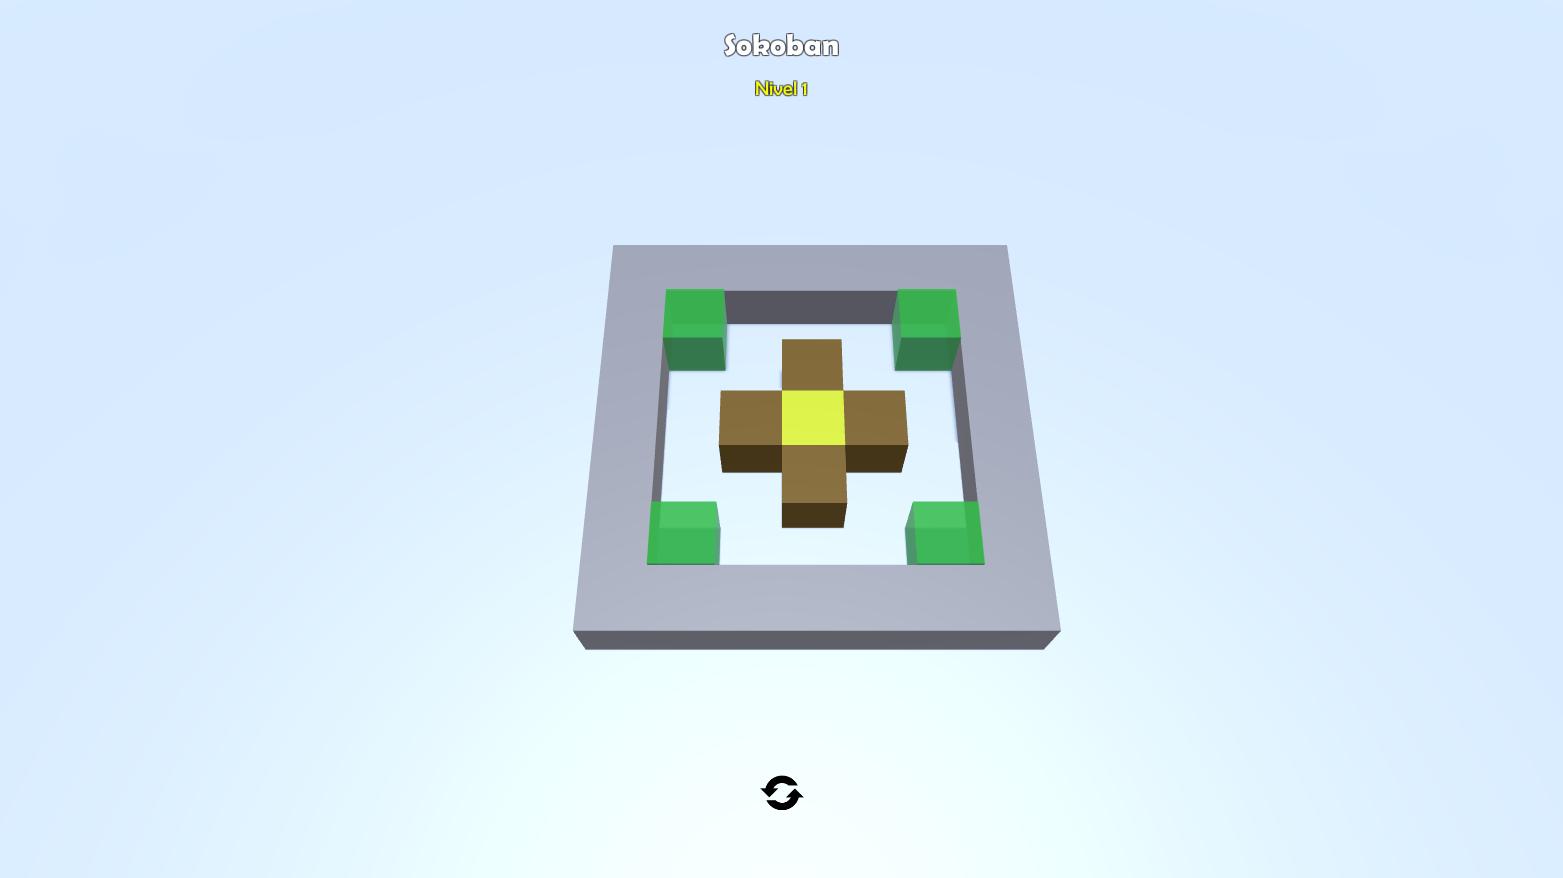 Sokoban level editor by maknuz